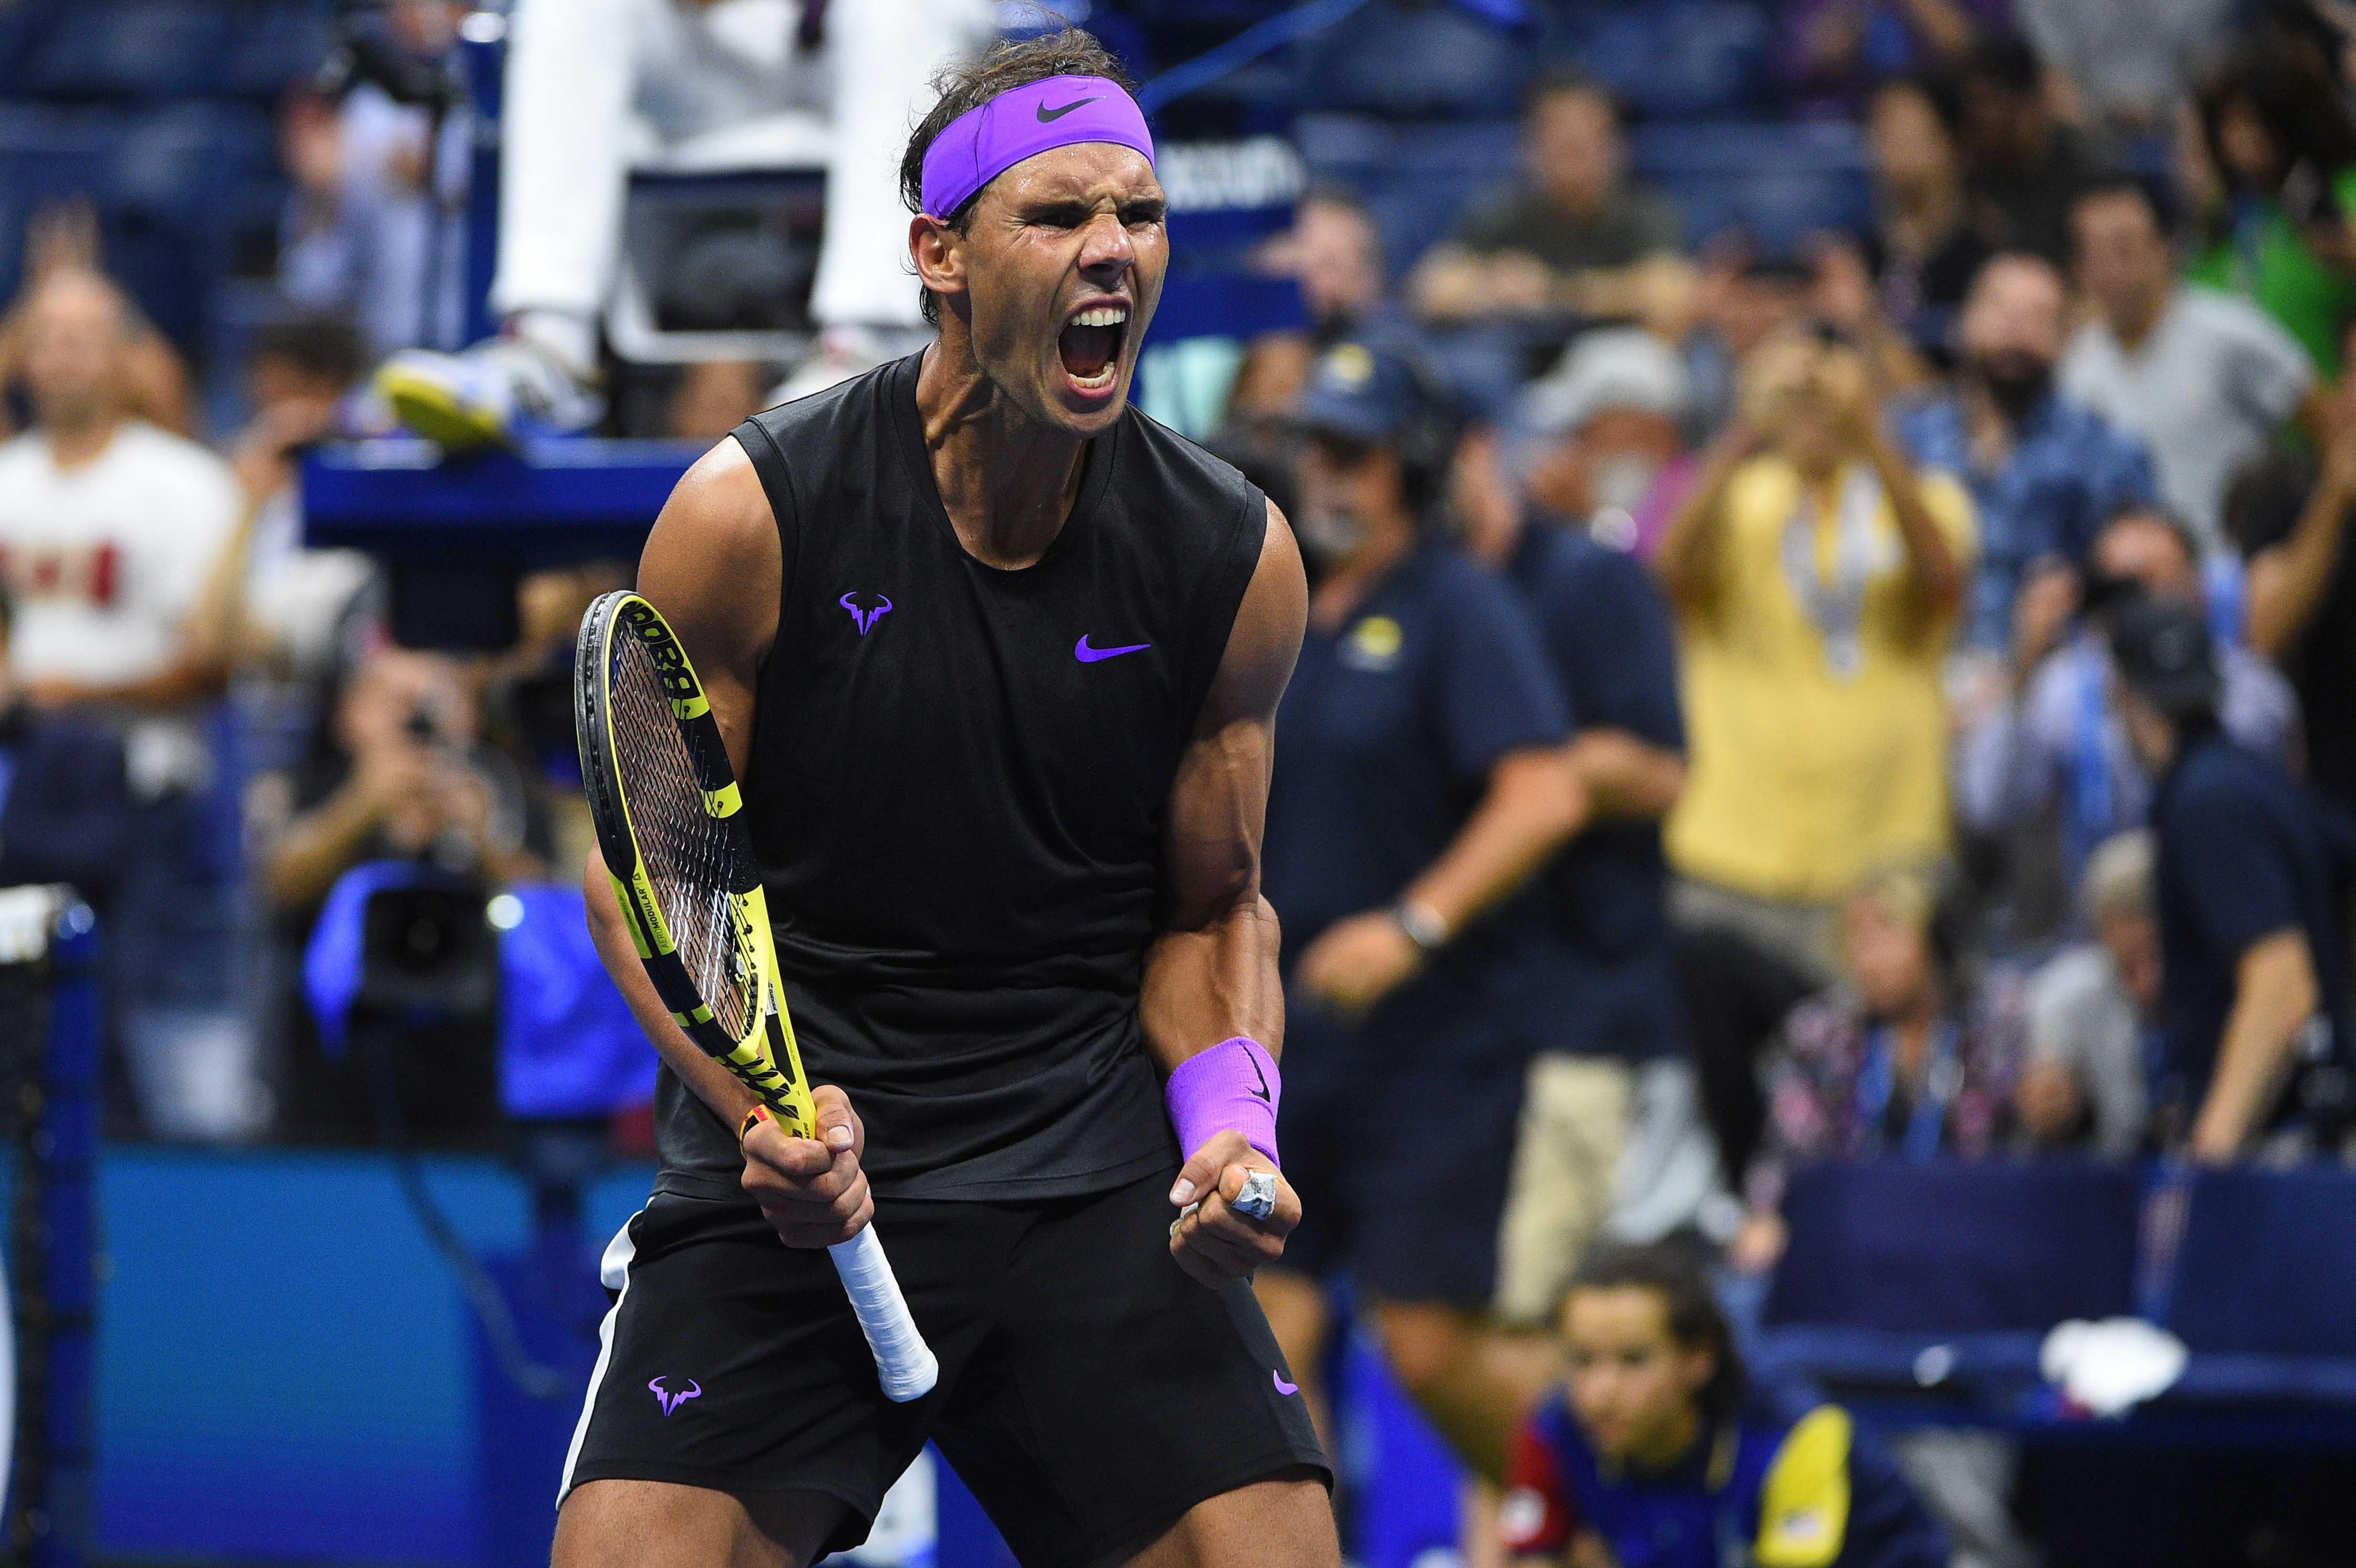 Hear Rafa Nadal roar during his quarterfinal at the 2019 US Open